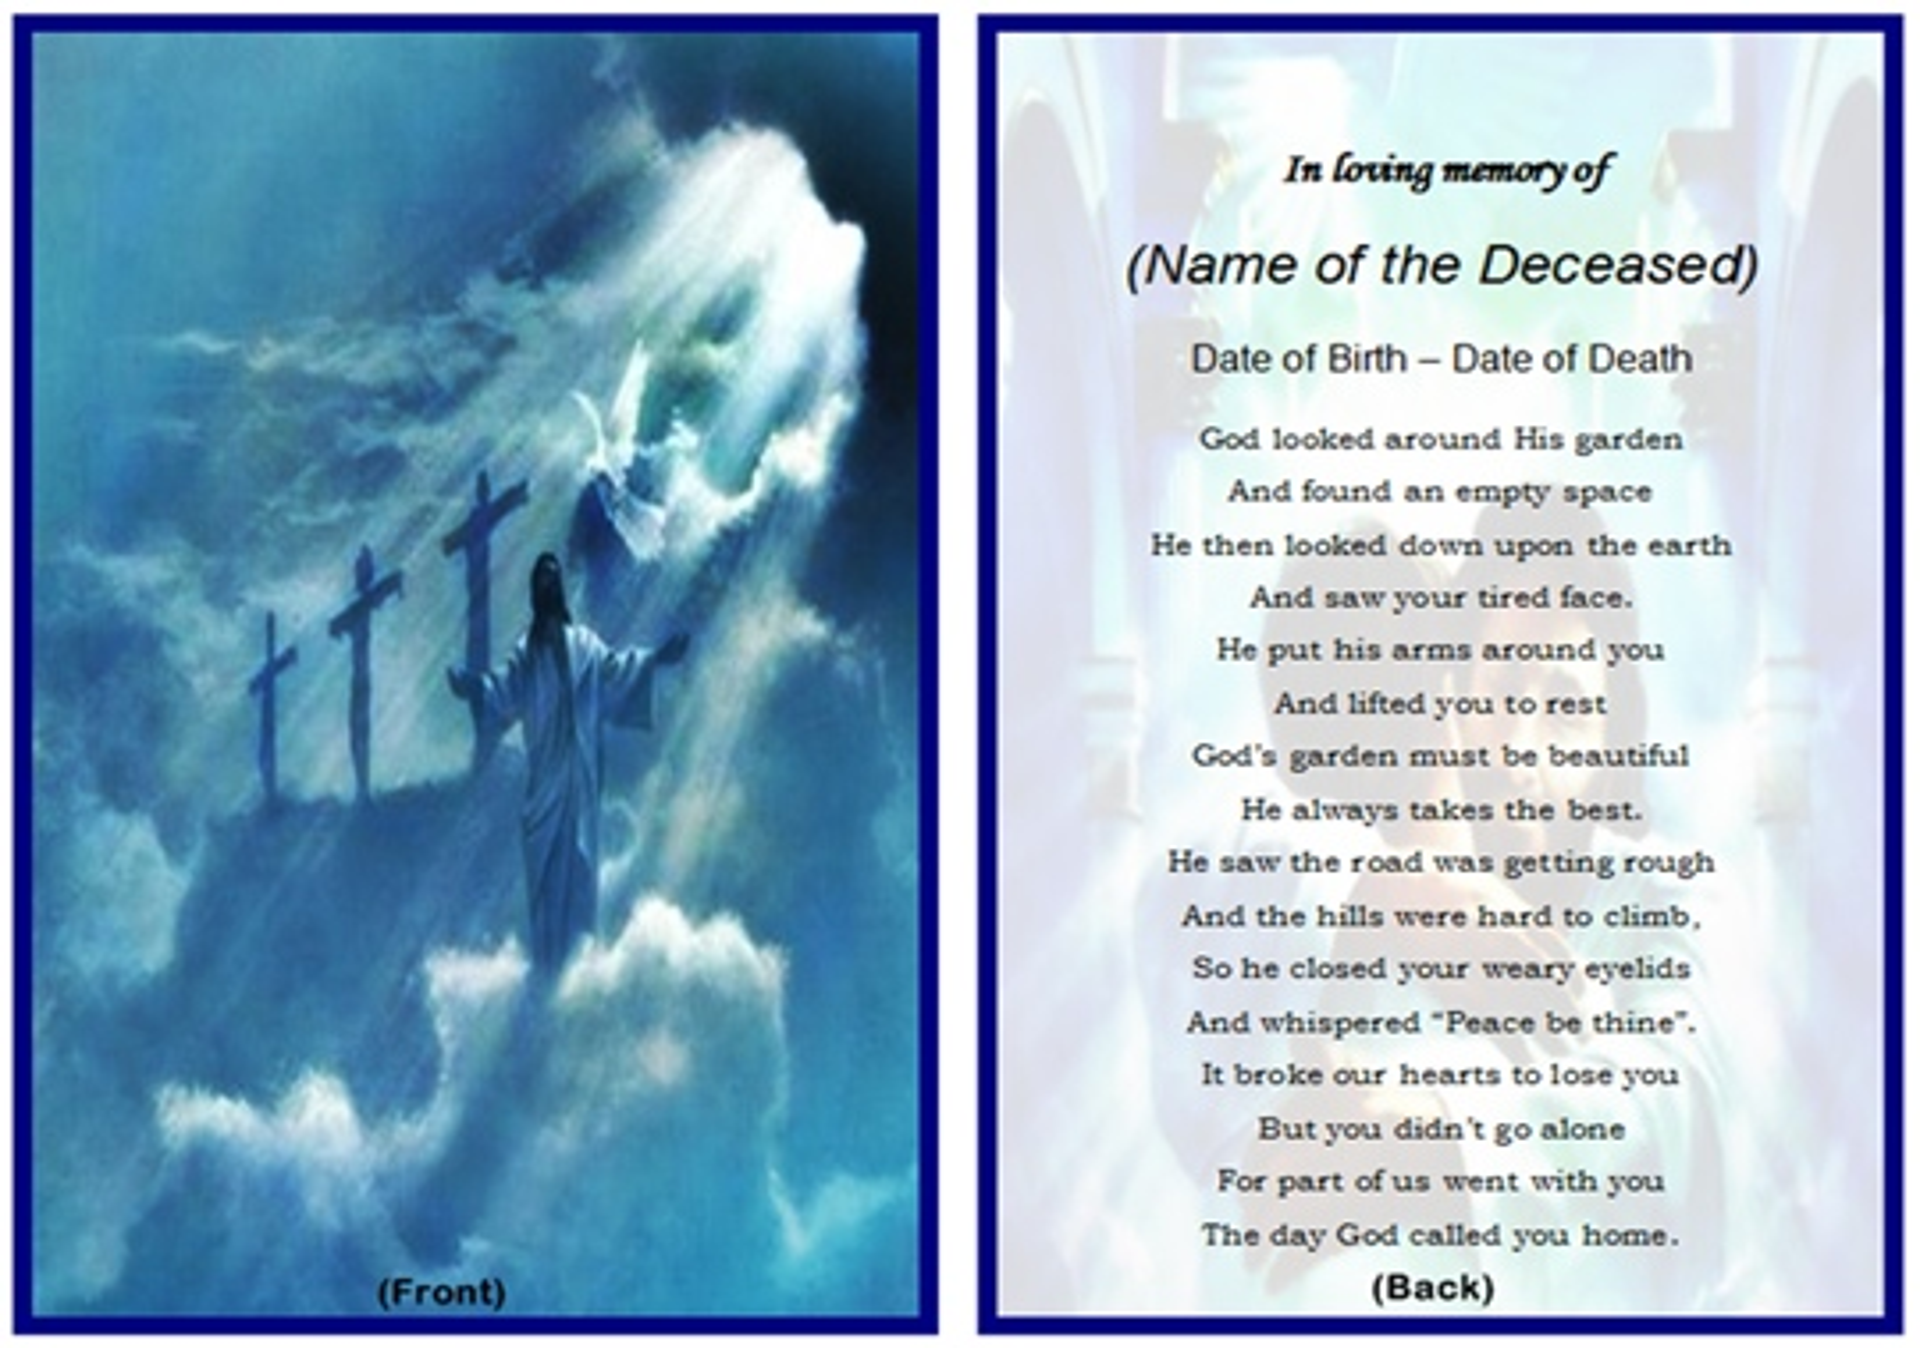 Effortless image regarding free printable funeral prayer card template